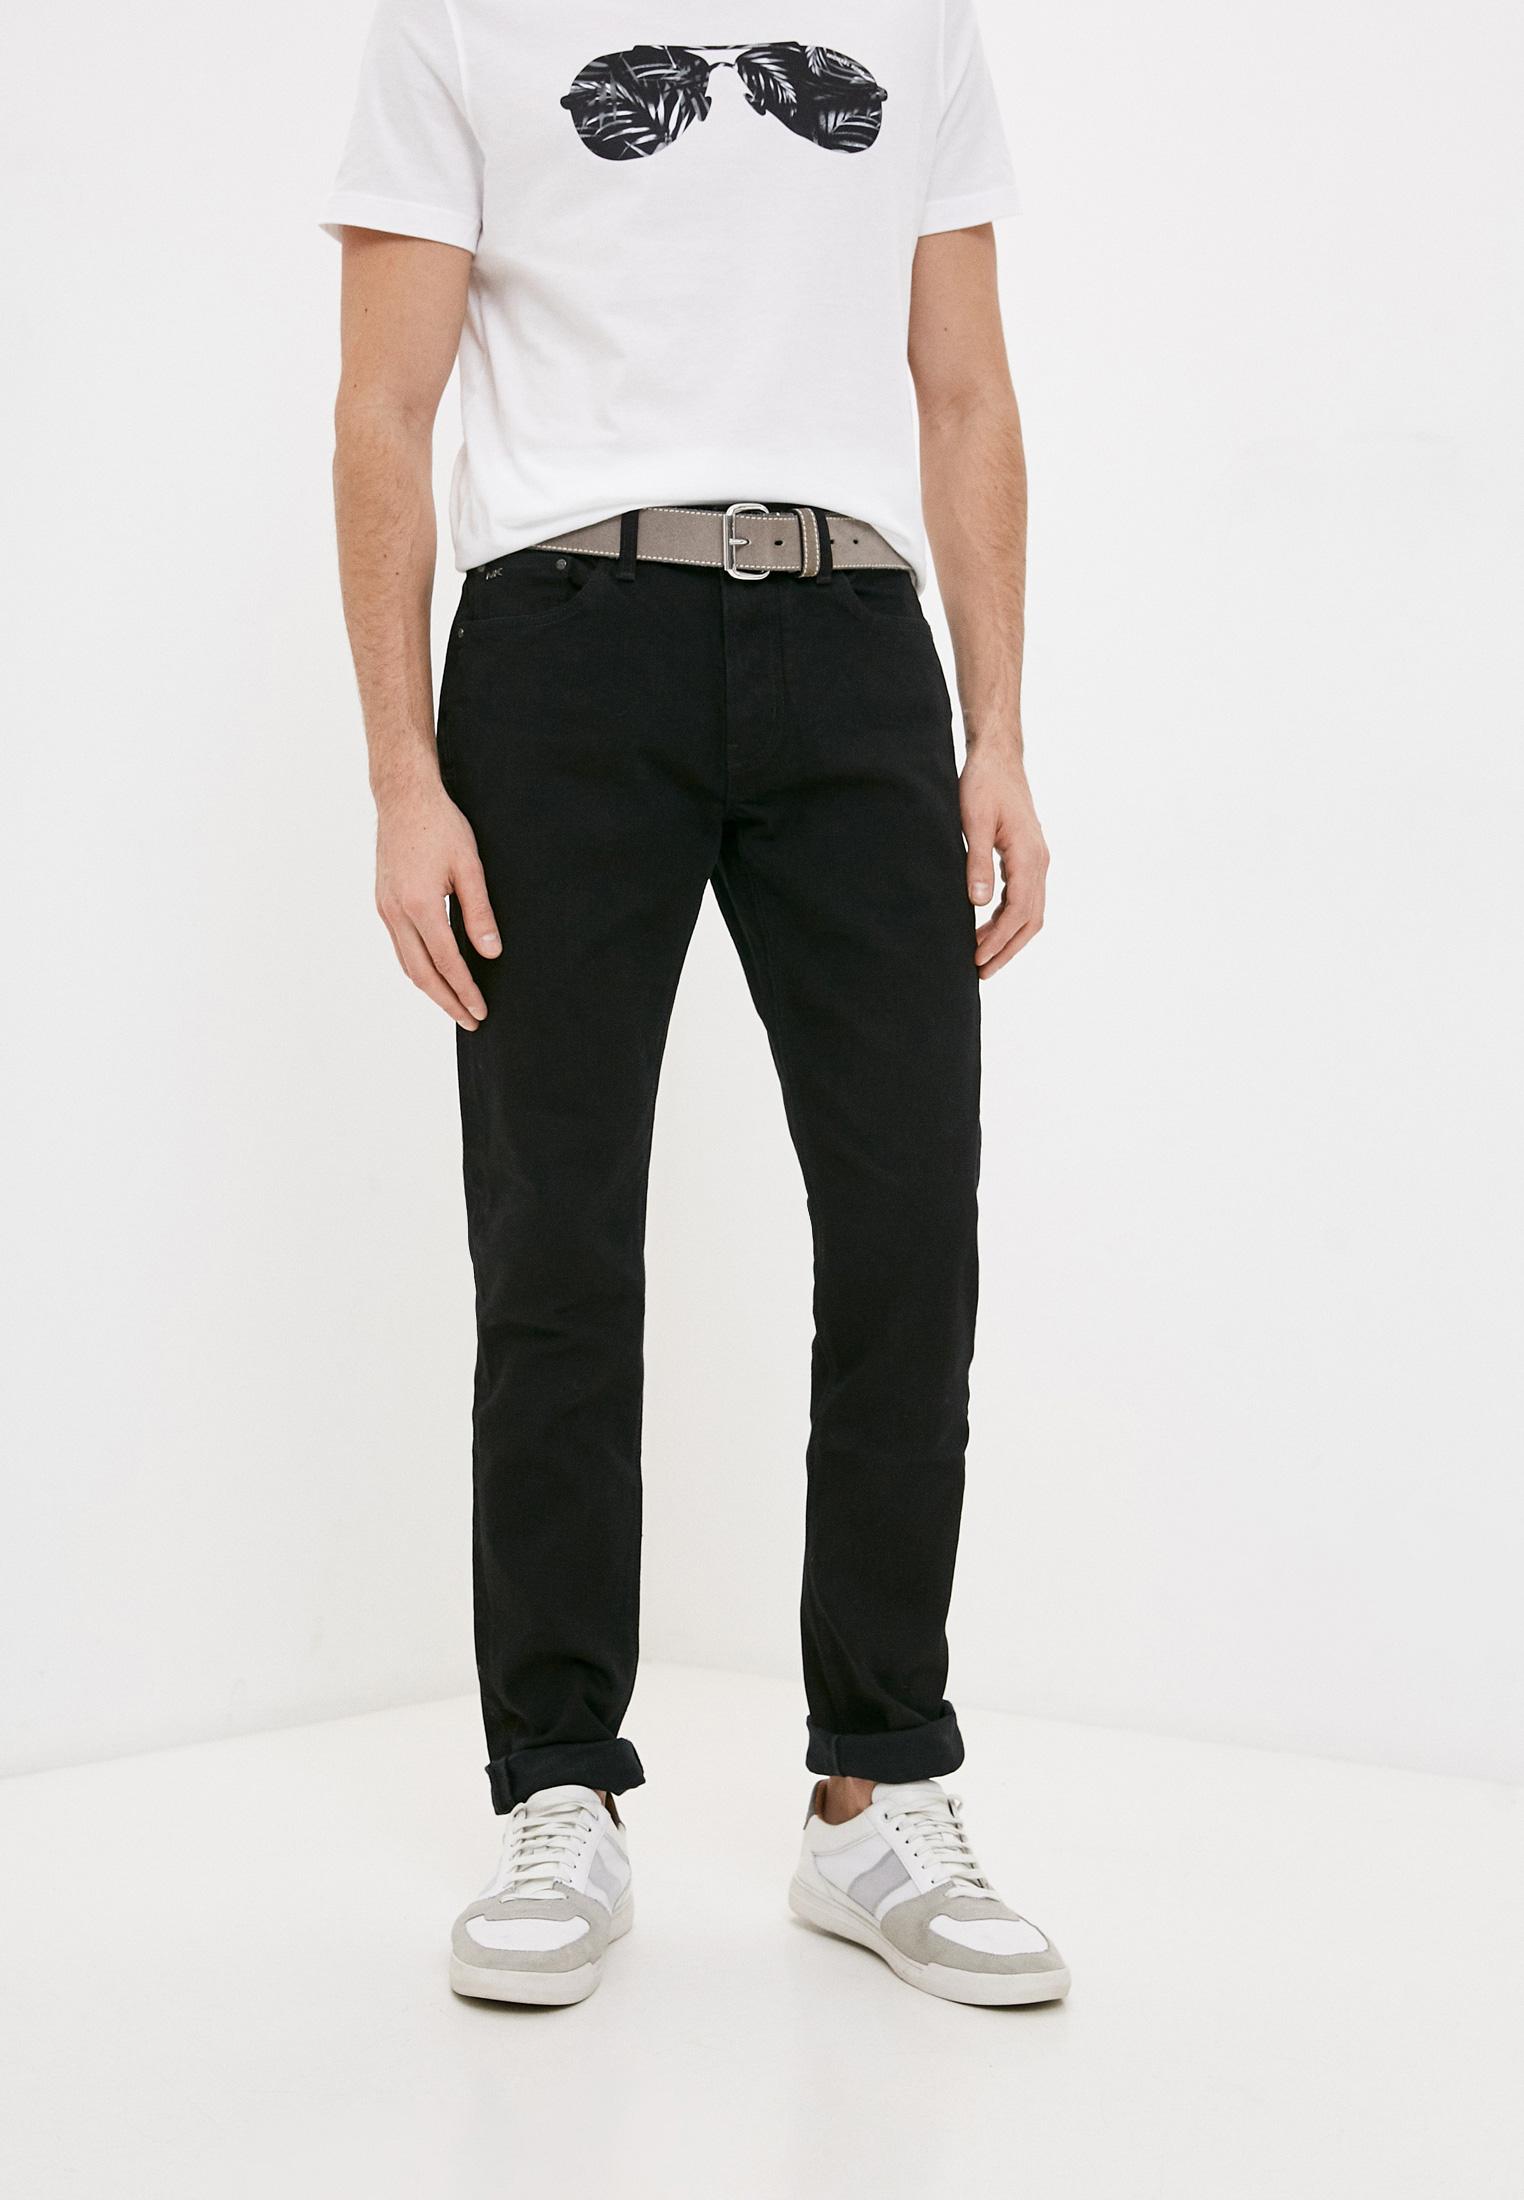 Зауженные джинсы Michael Kors CB99A5G1ZC